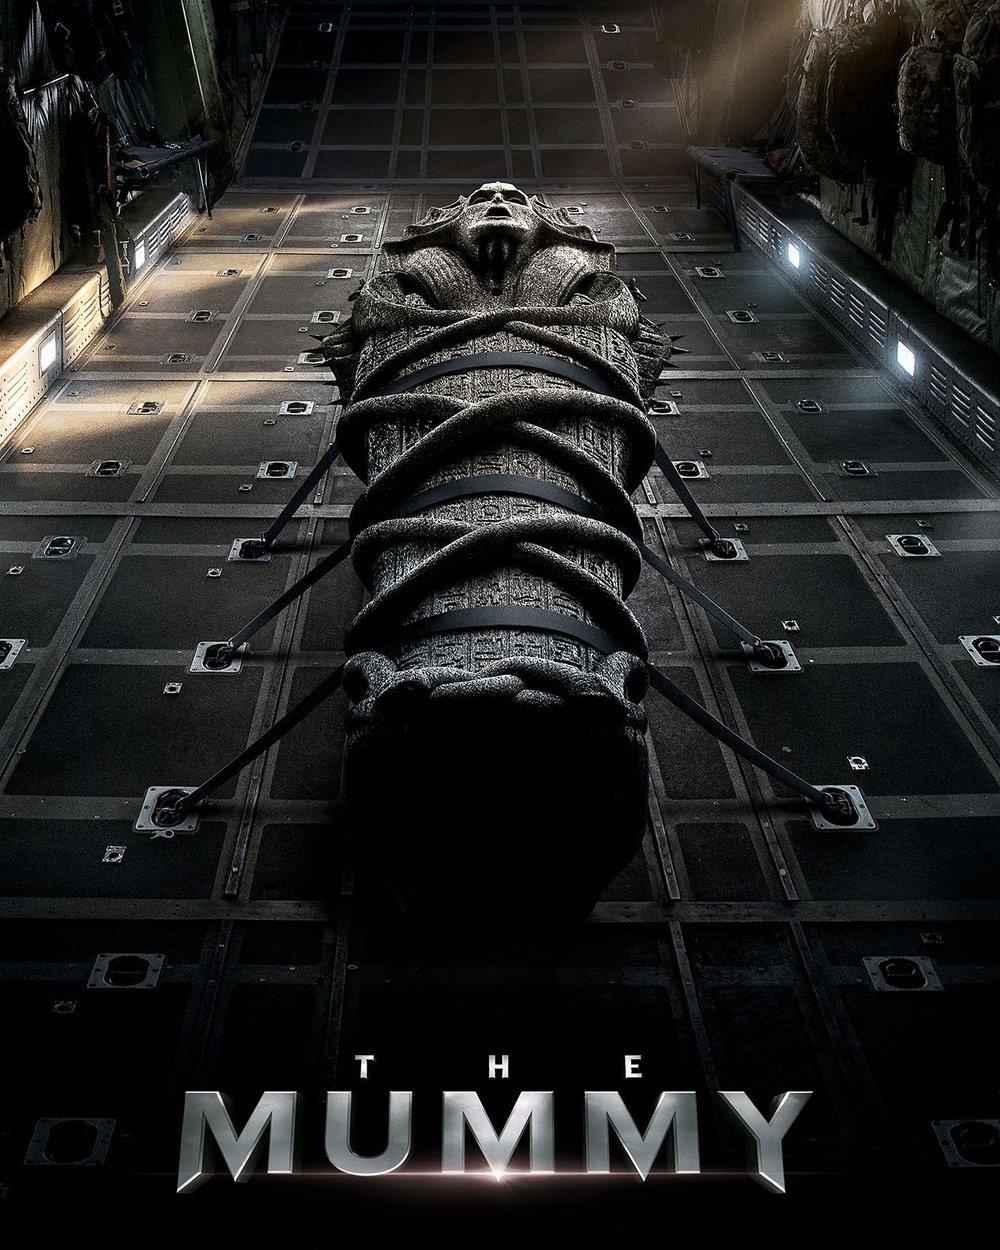 mummy-poster-1.jpg